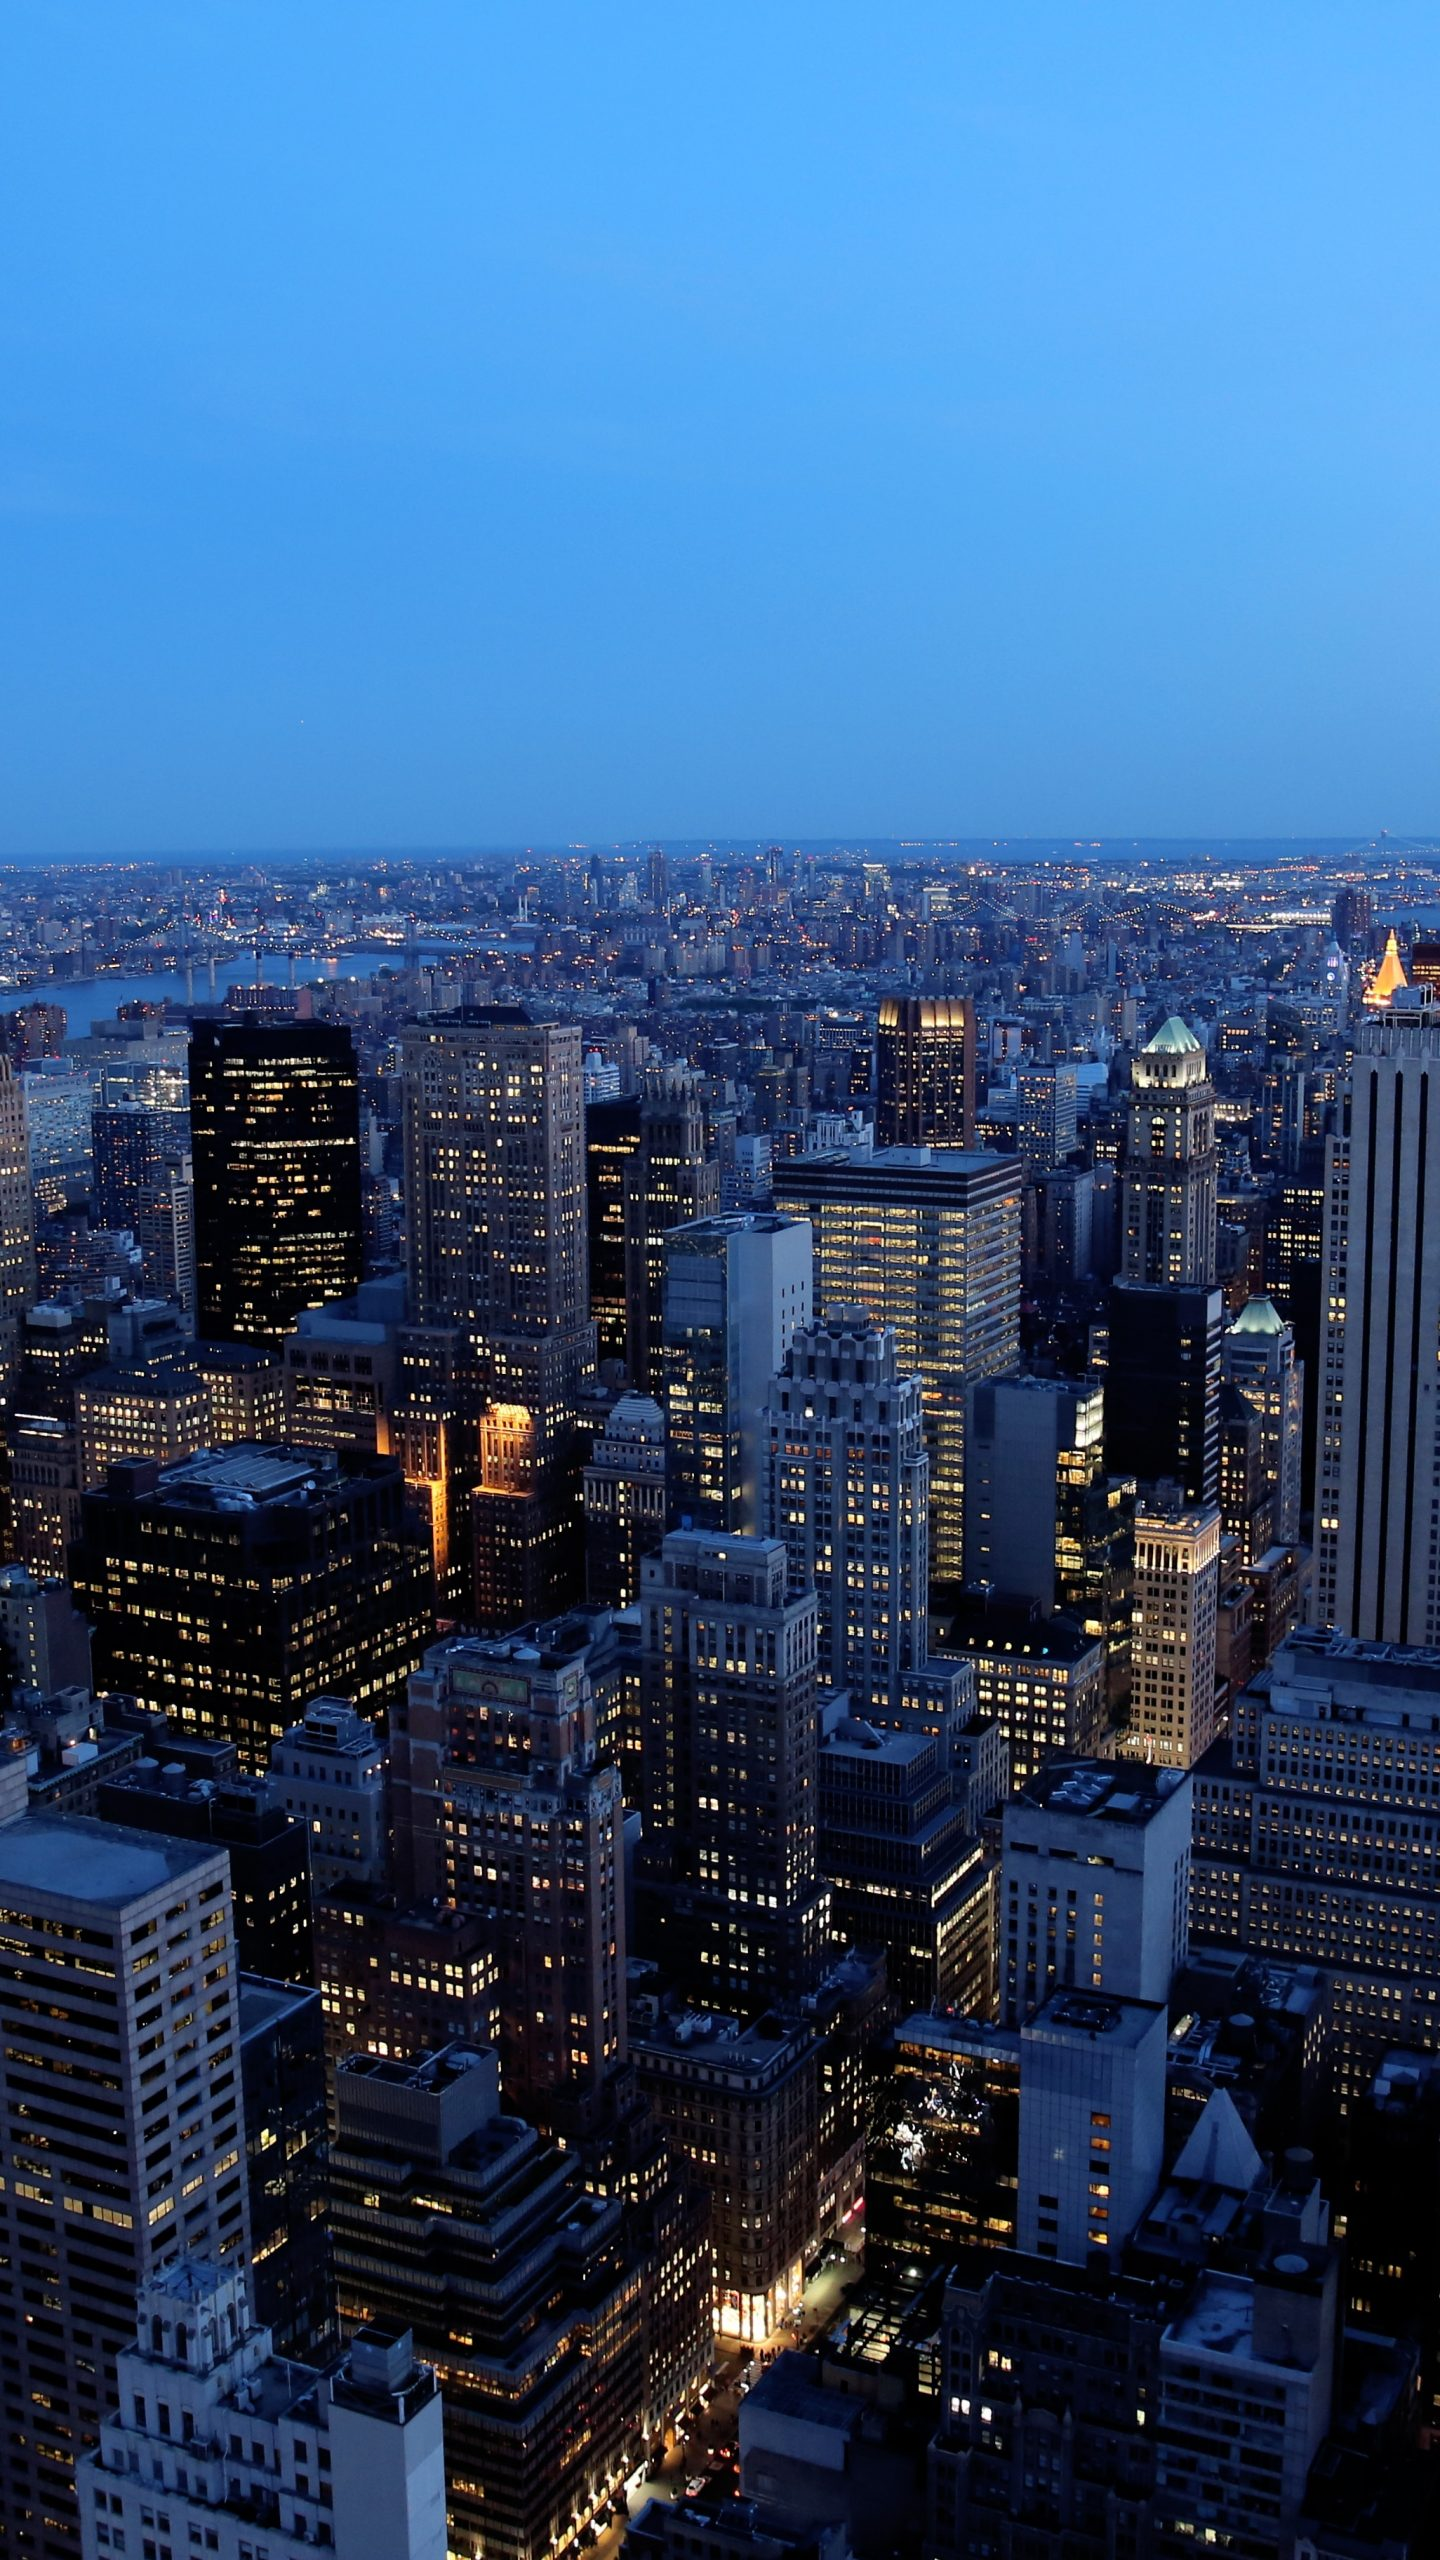 New York City Wallpaper Iphone X New York City 5k Uhd Wallpaper